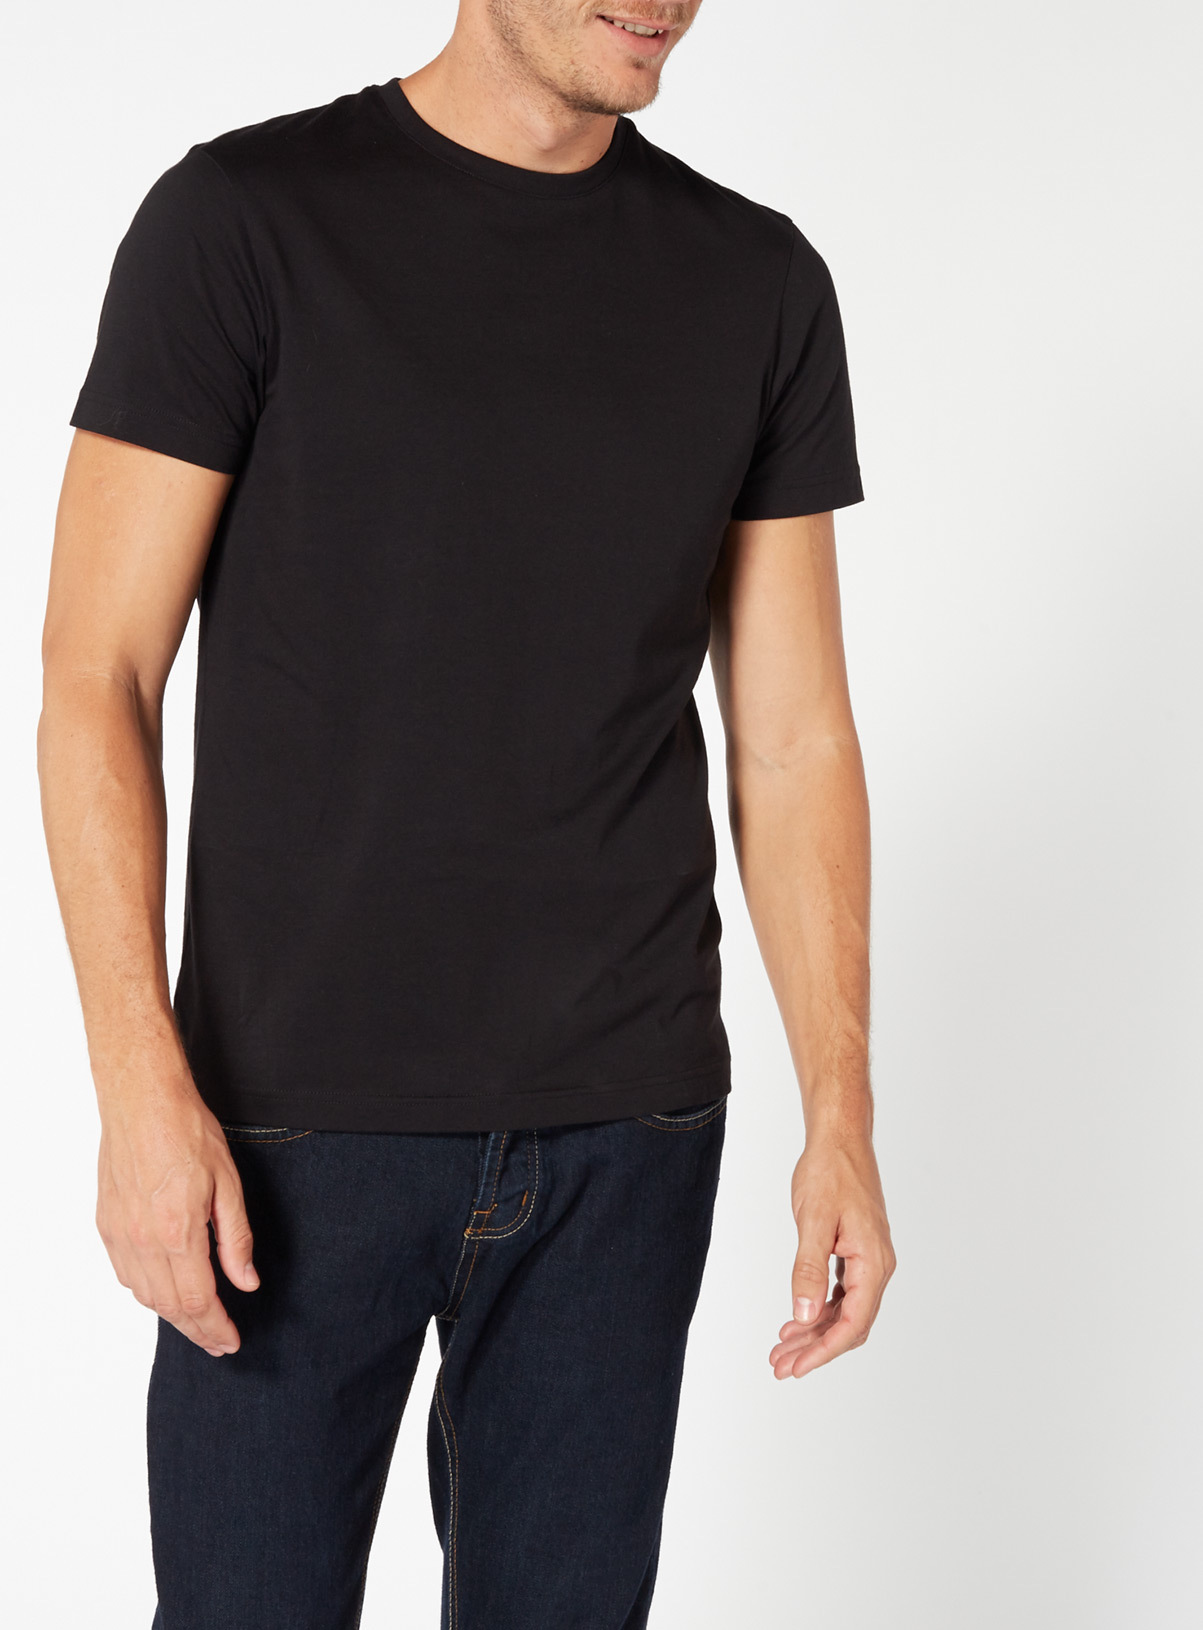 Black t shirt round neck - Black Crew Neck T Shirt